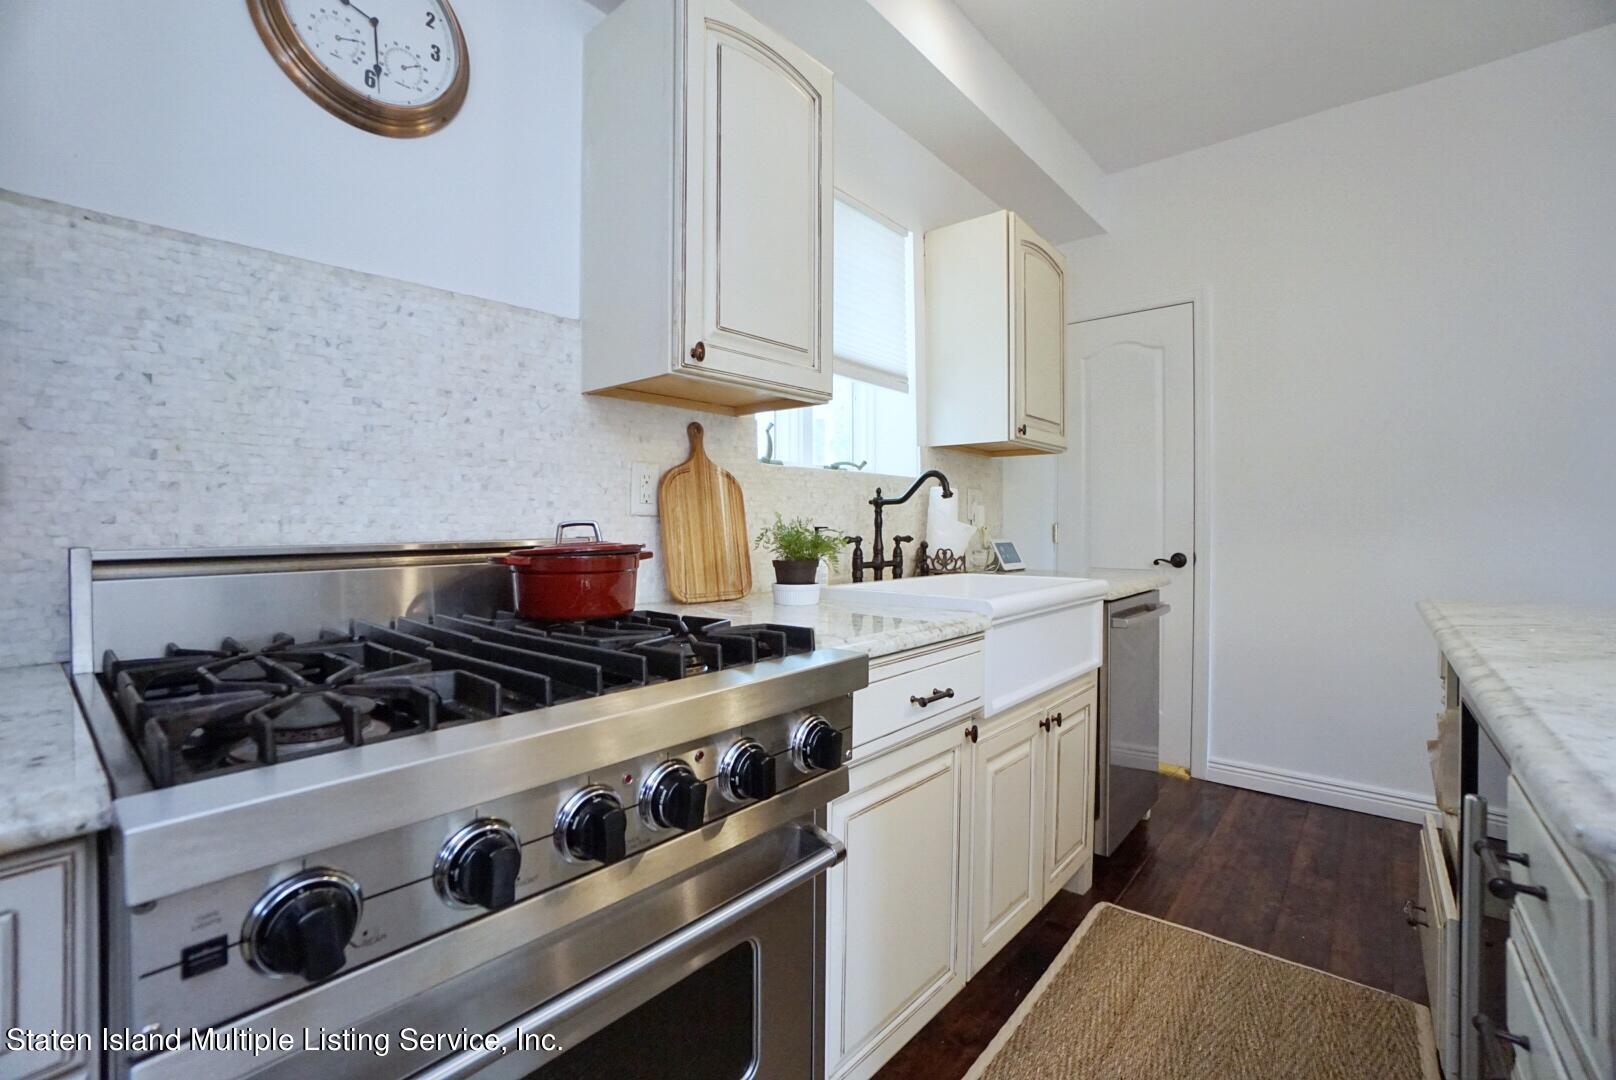 Single Family - Detached 311 Bement Avenue  Staten Island, NY 10310, MLS-1147133-16